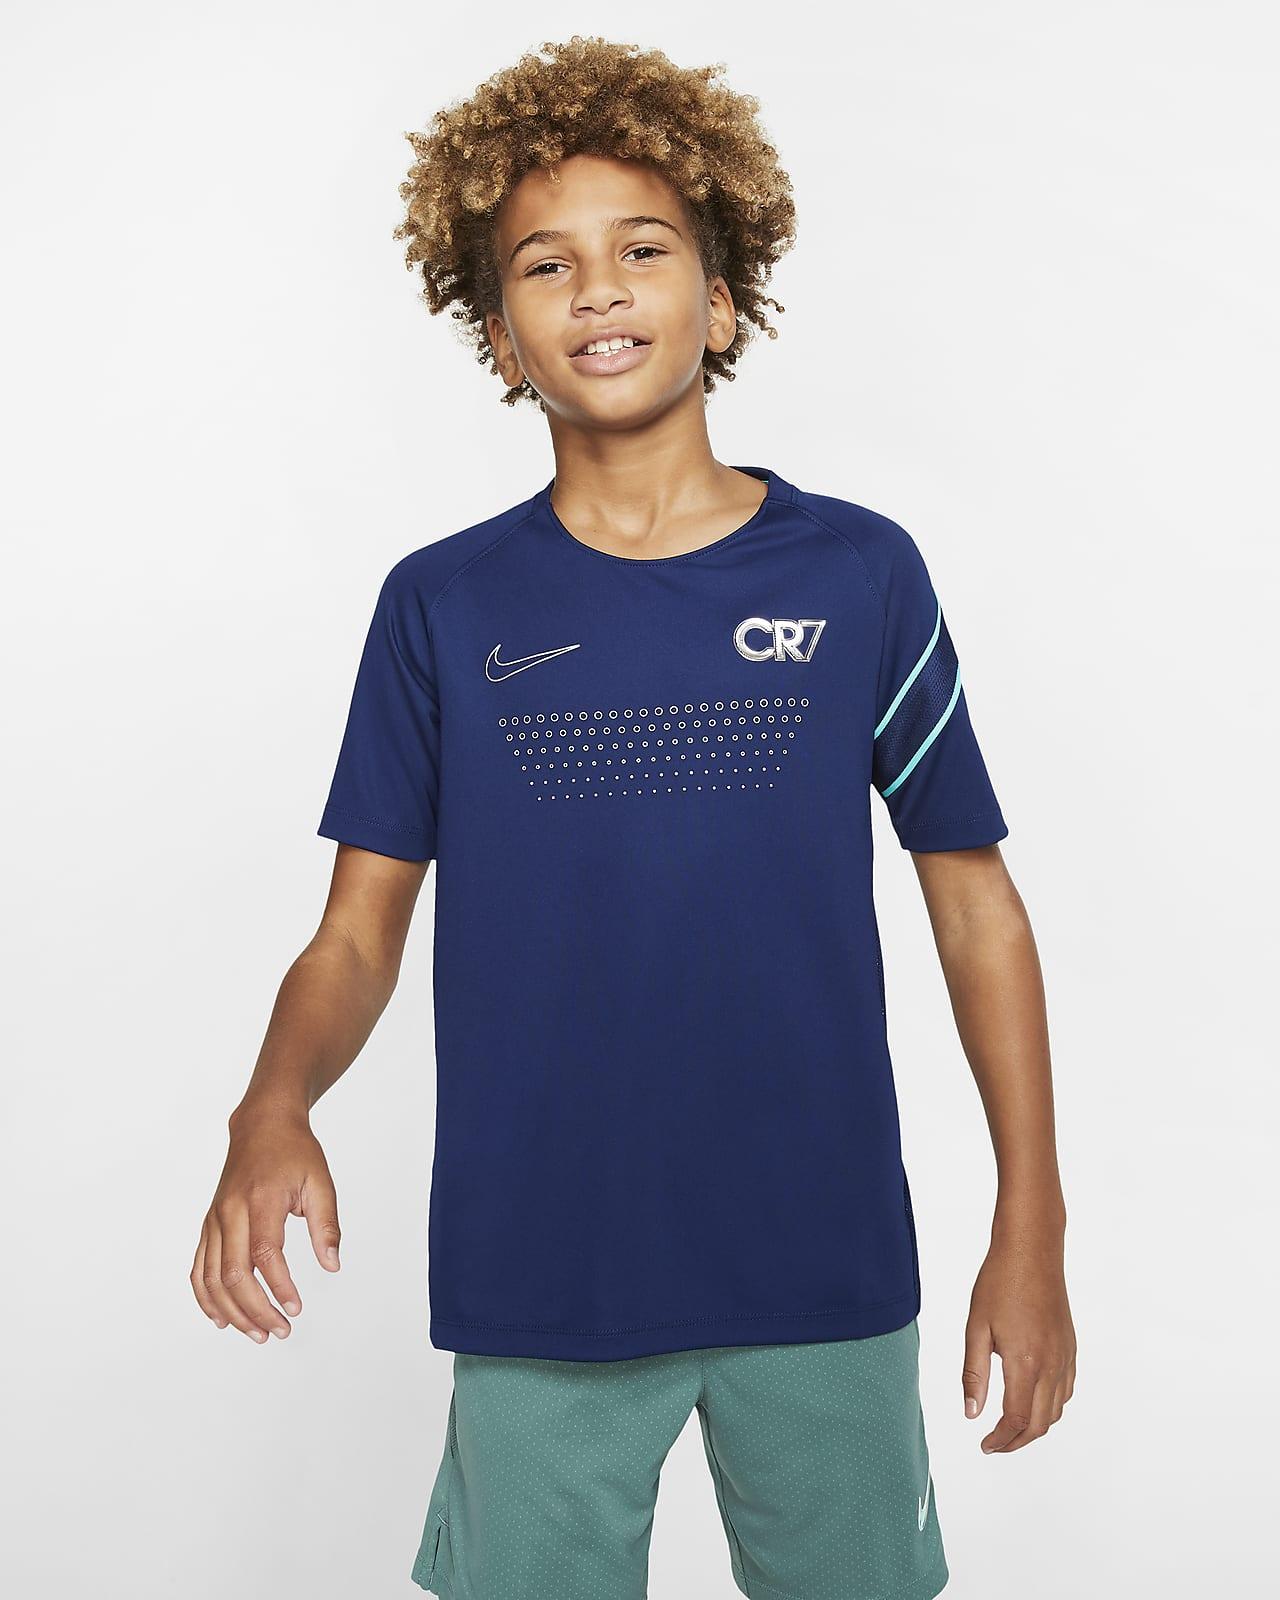 Nike Dri-FIT CR7 Kurzarm-Fußballoberteil für ältere Kinder